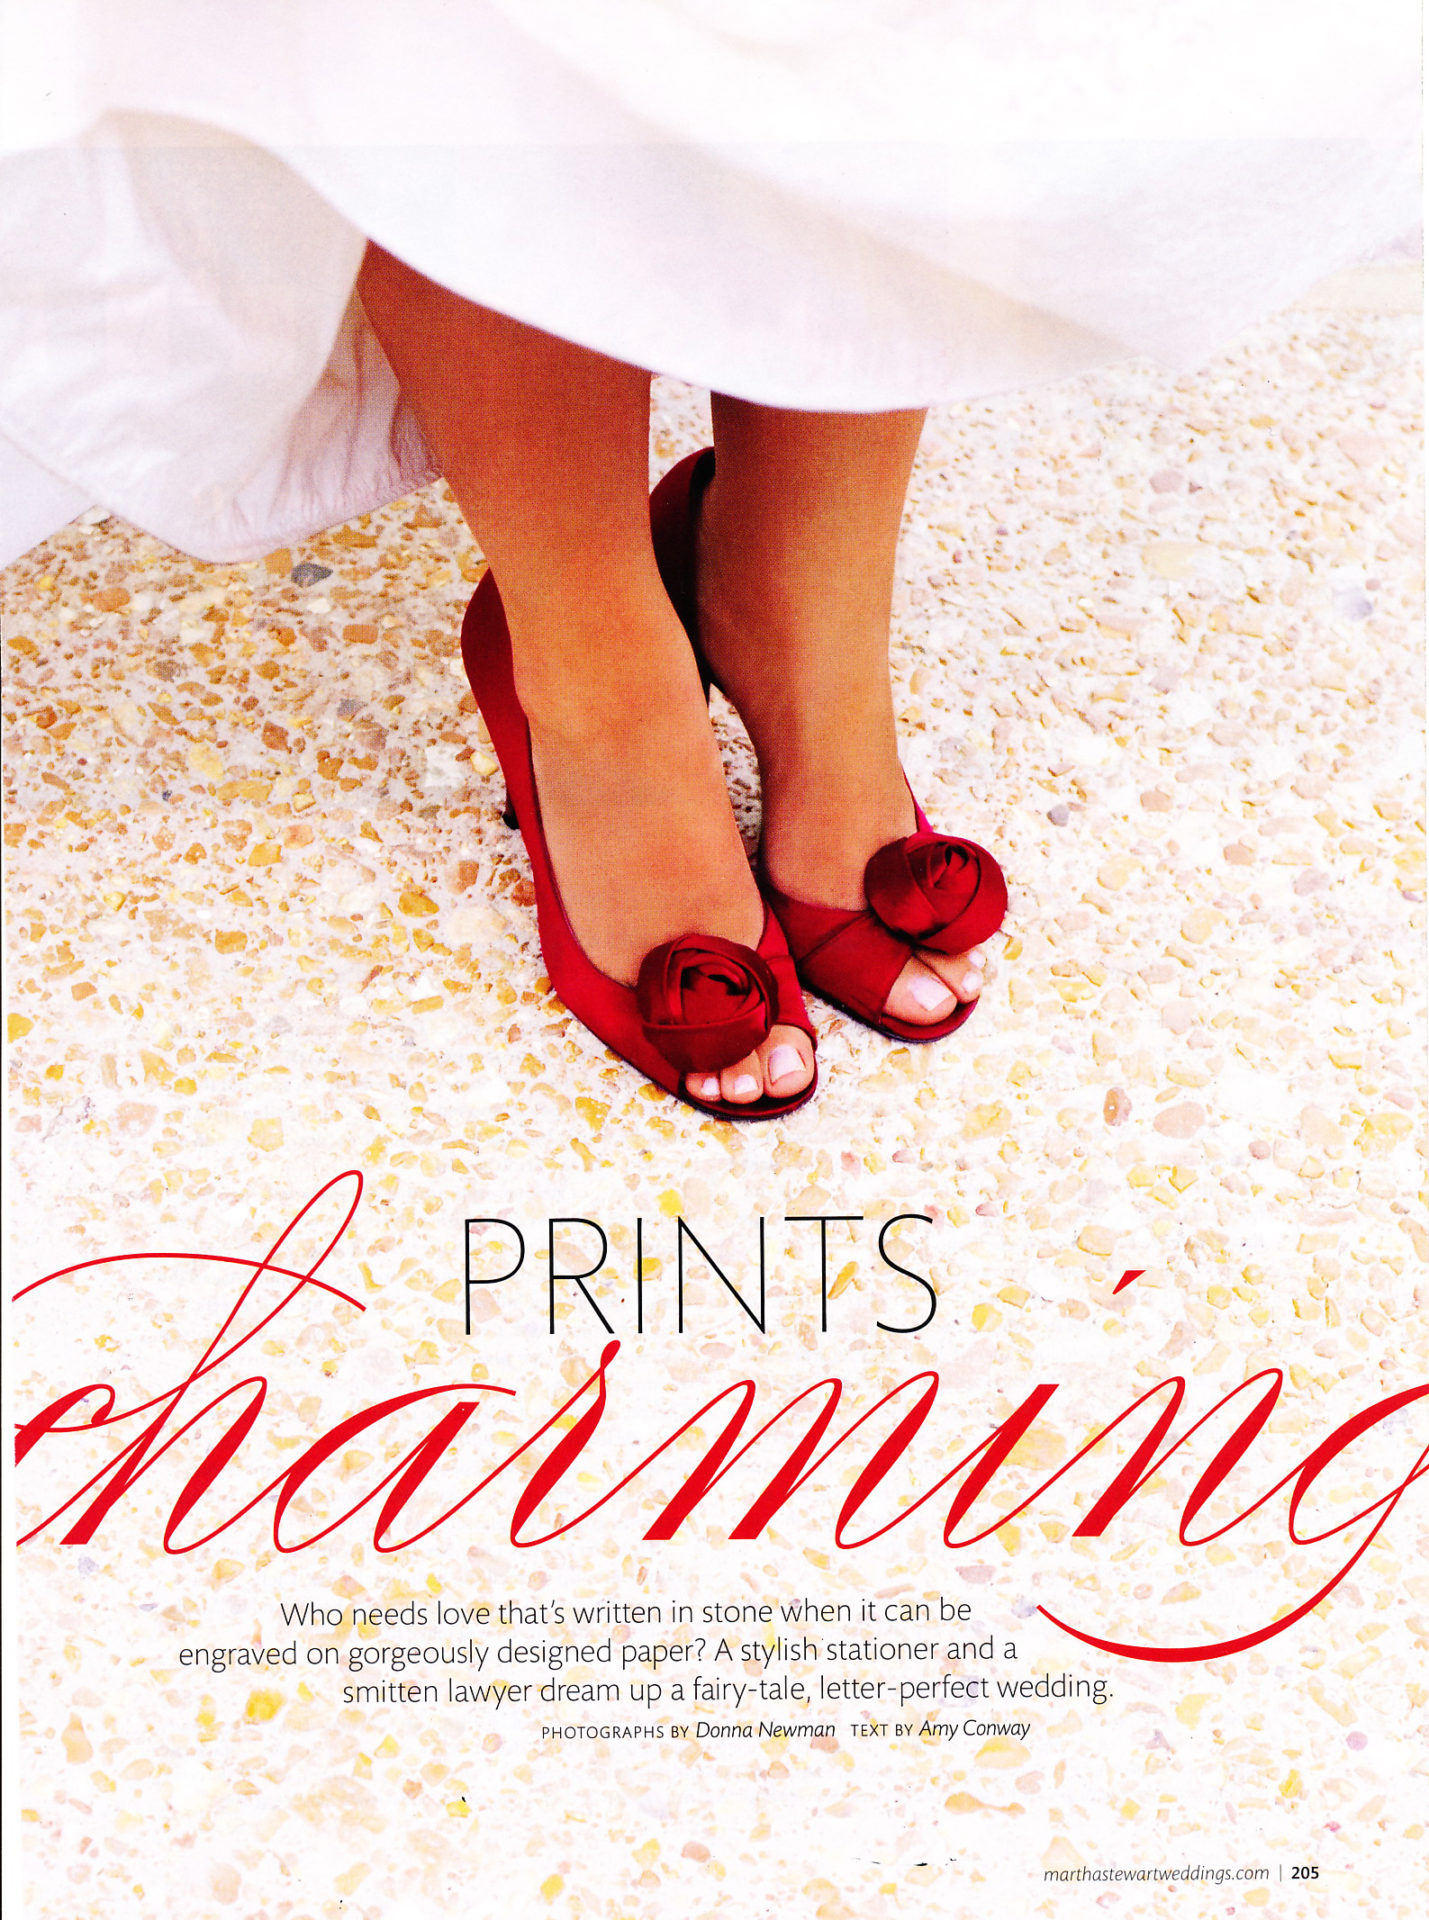 Martha Stewart WeddingsSummer 2009 - Cheree Berry Paper